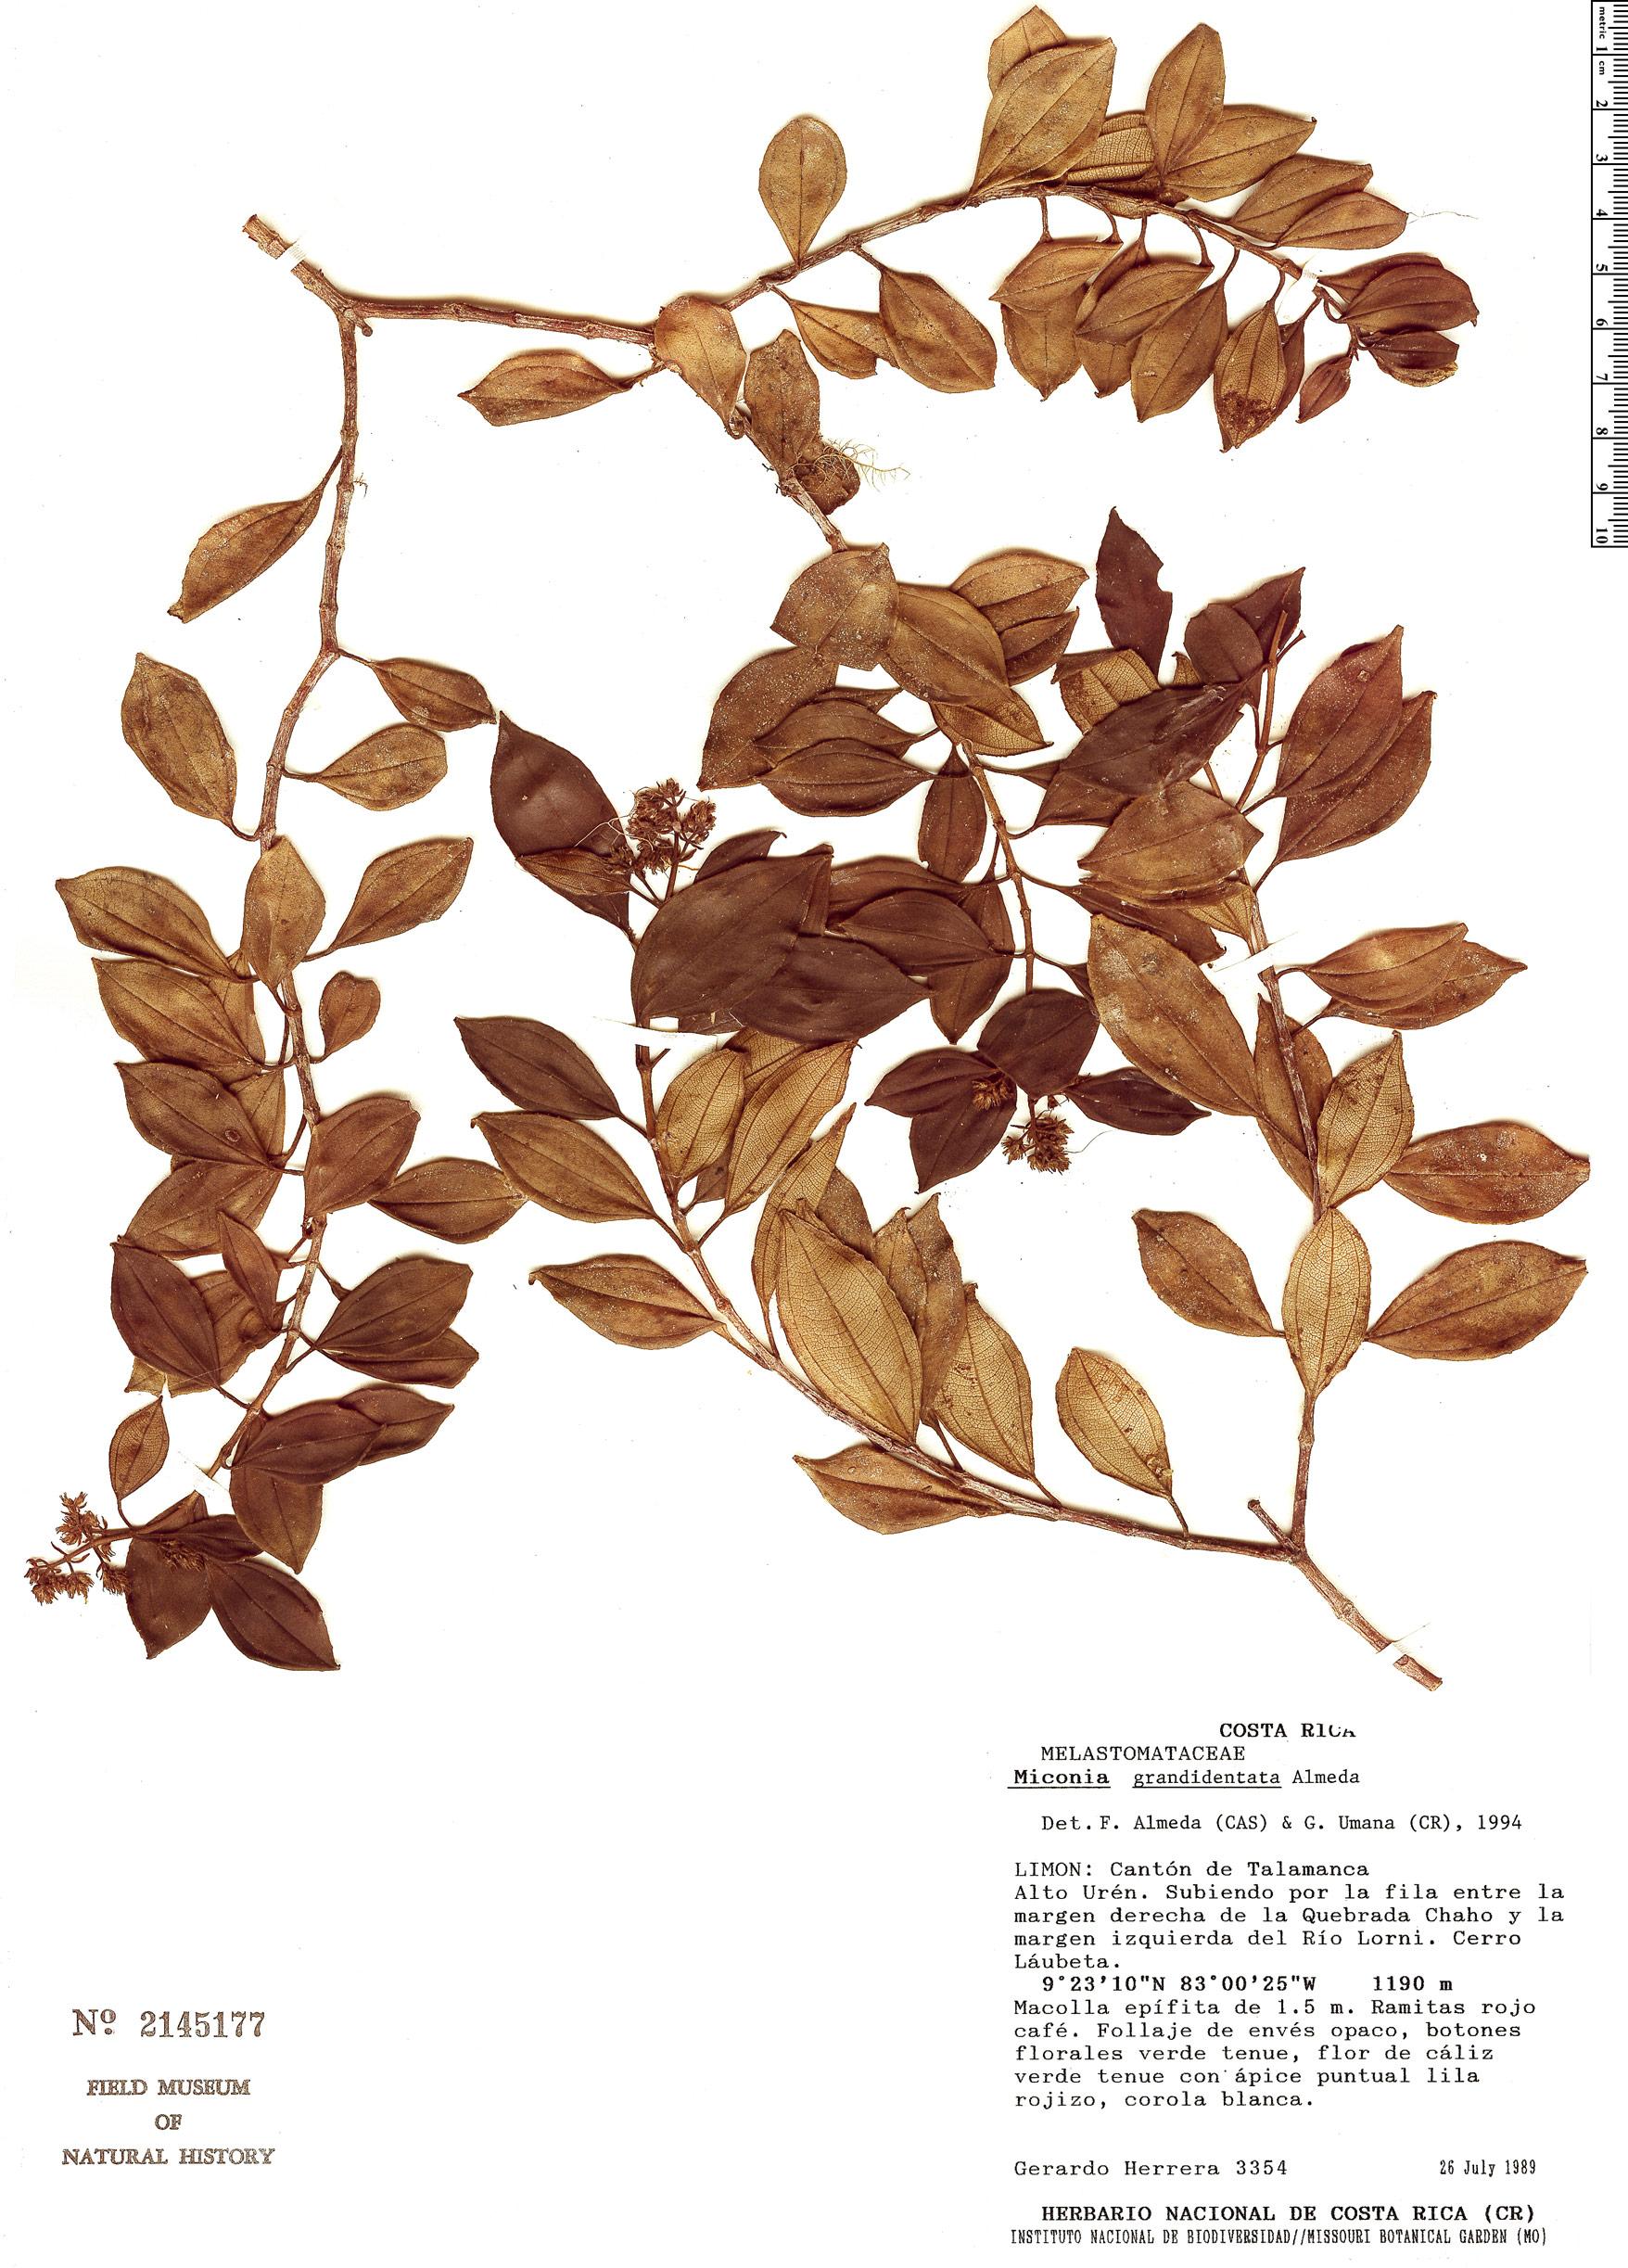 Specimen: Miconia grandidentata